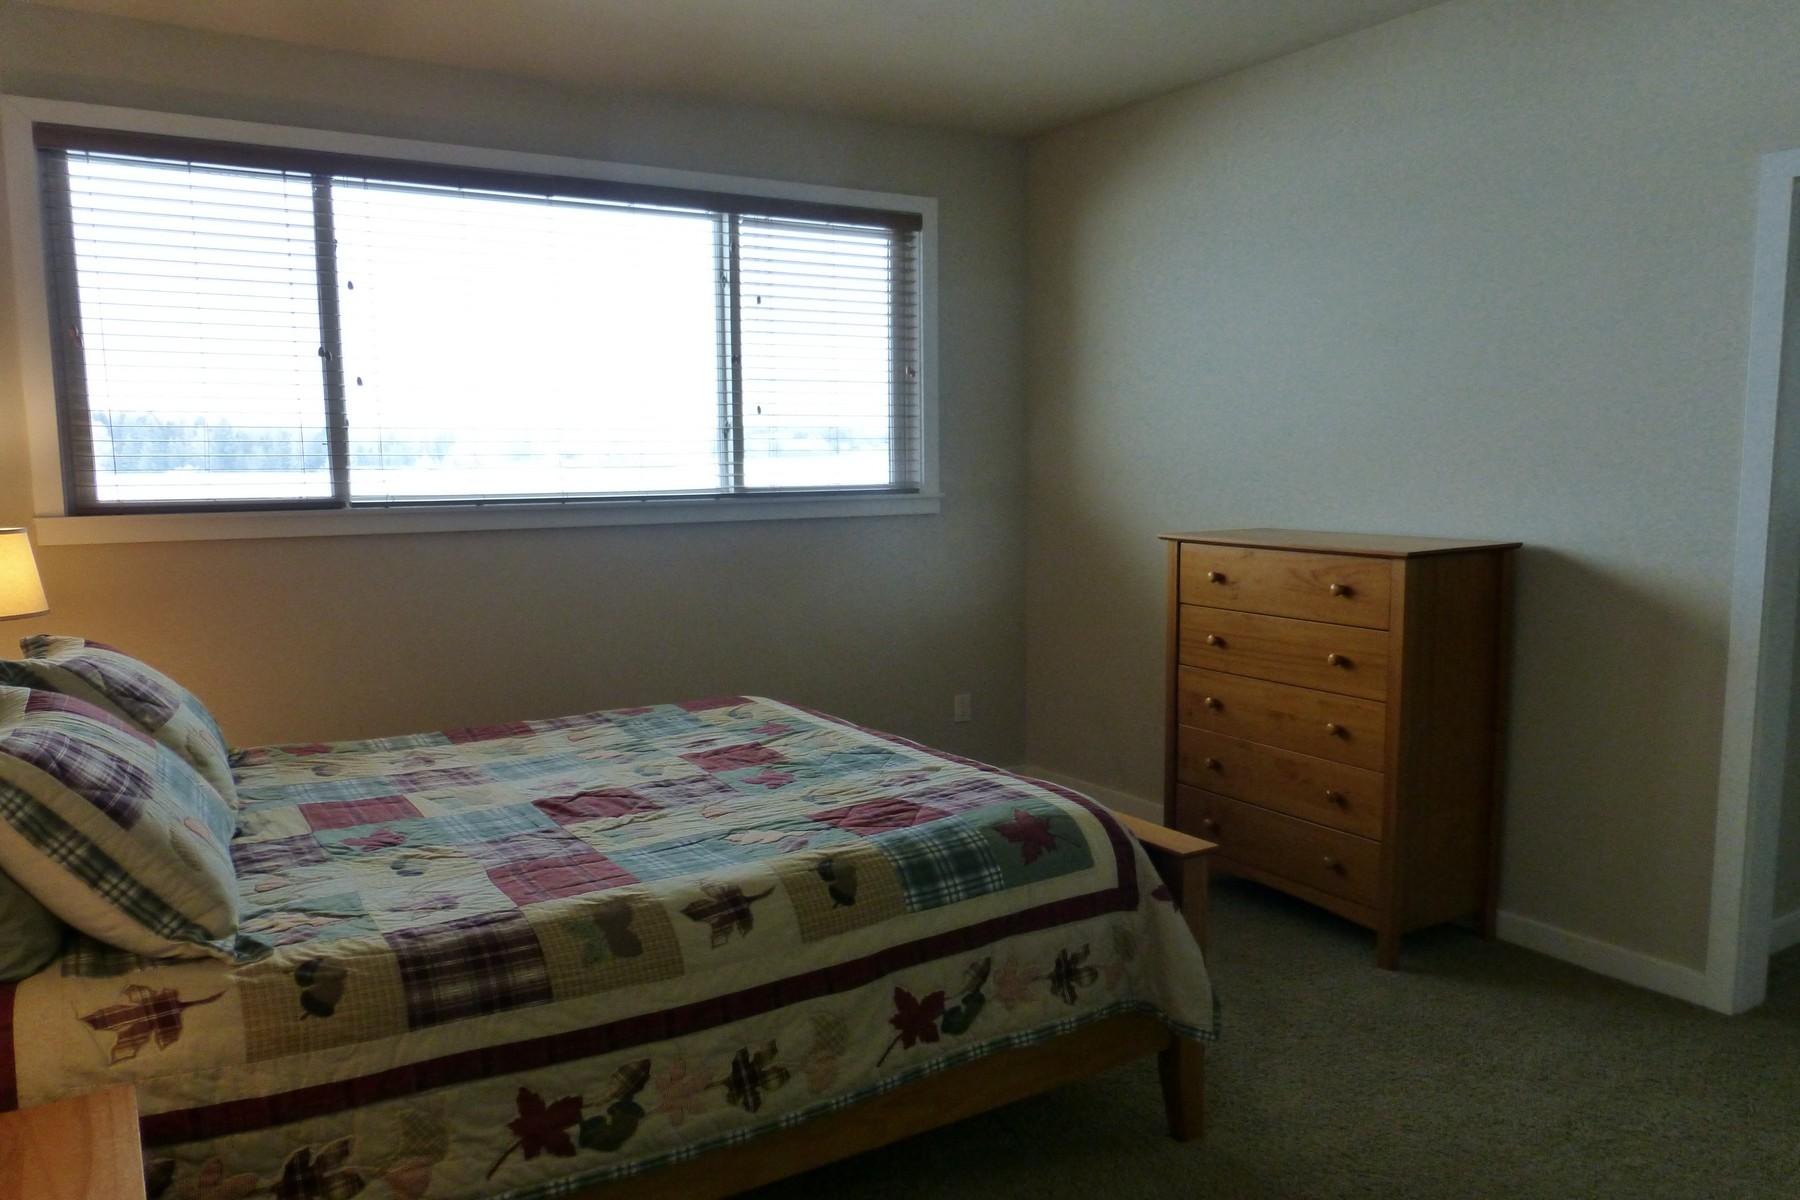 Additional photo for property listing at 6205 Davos Lane, Unit K, Whitefish, MT 59937 6205  Davos Ln Unit K Whitefish, Montana 59937 United States